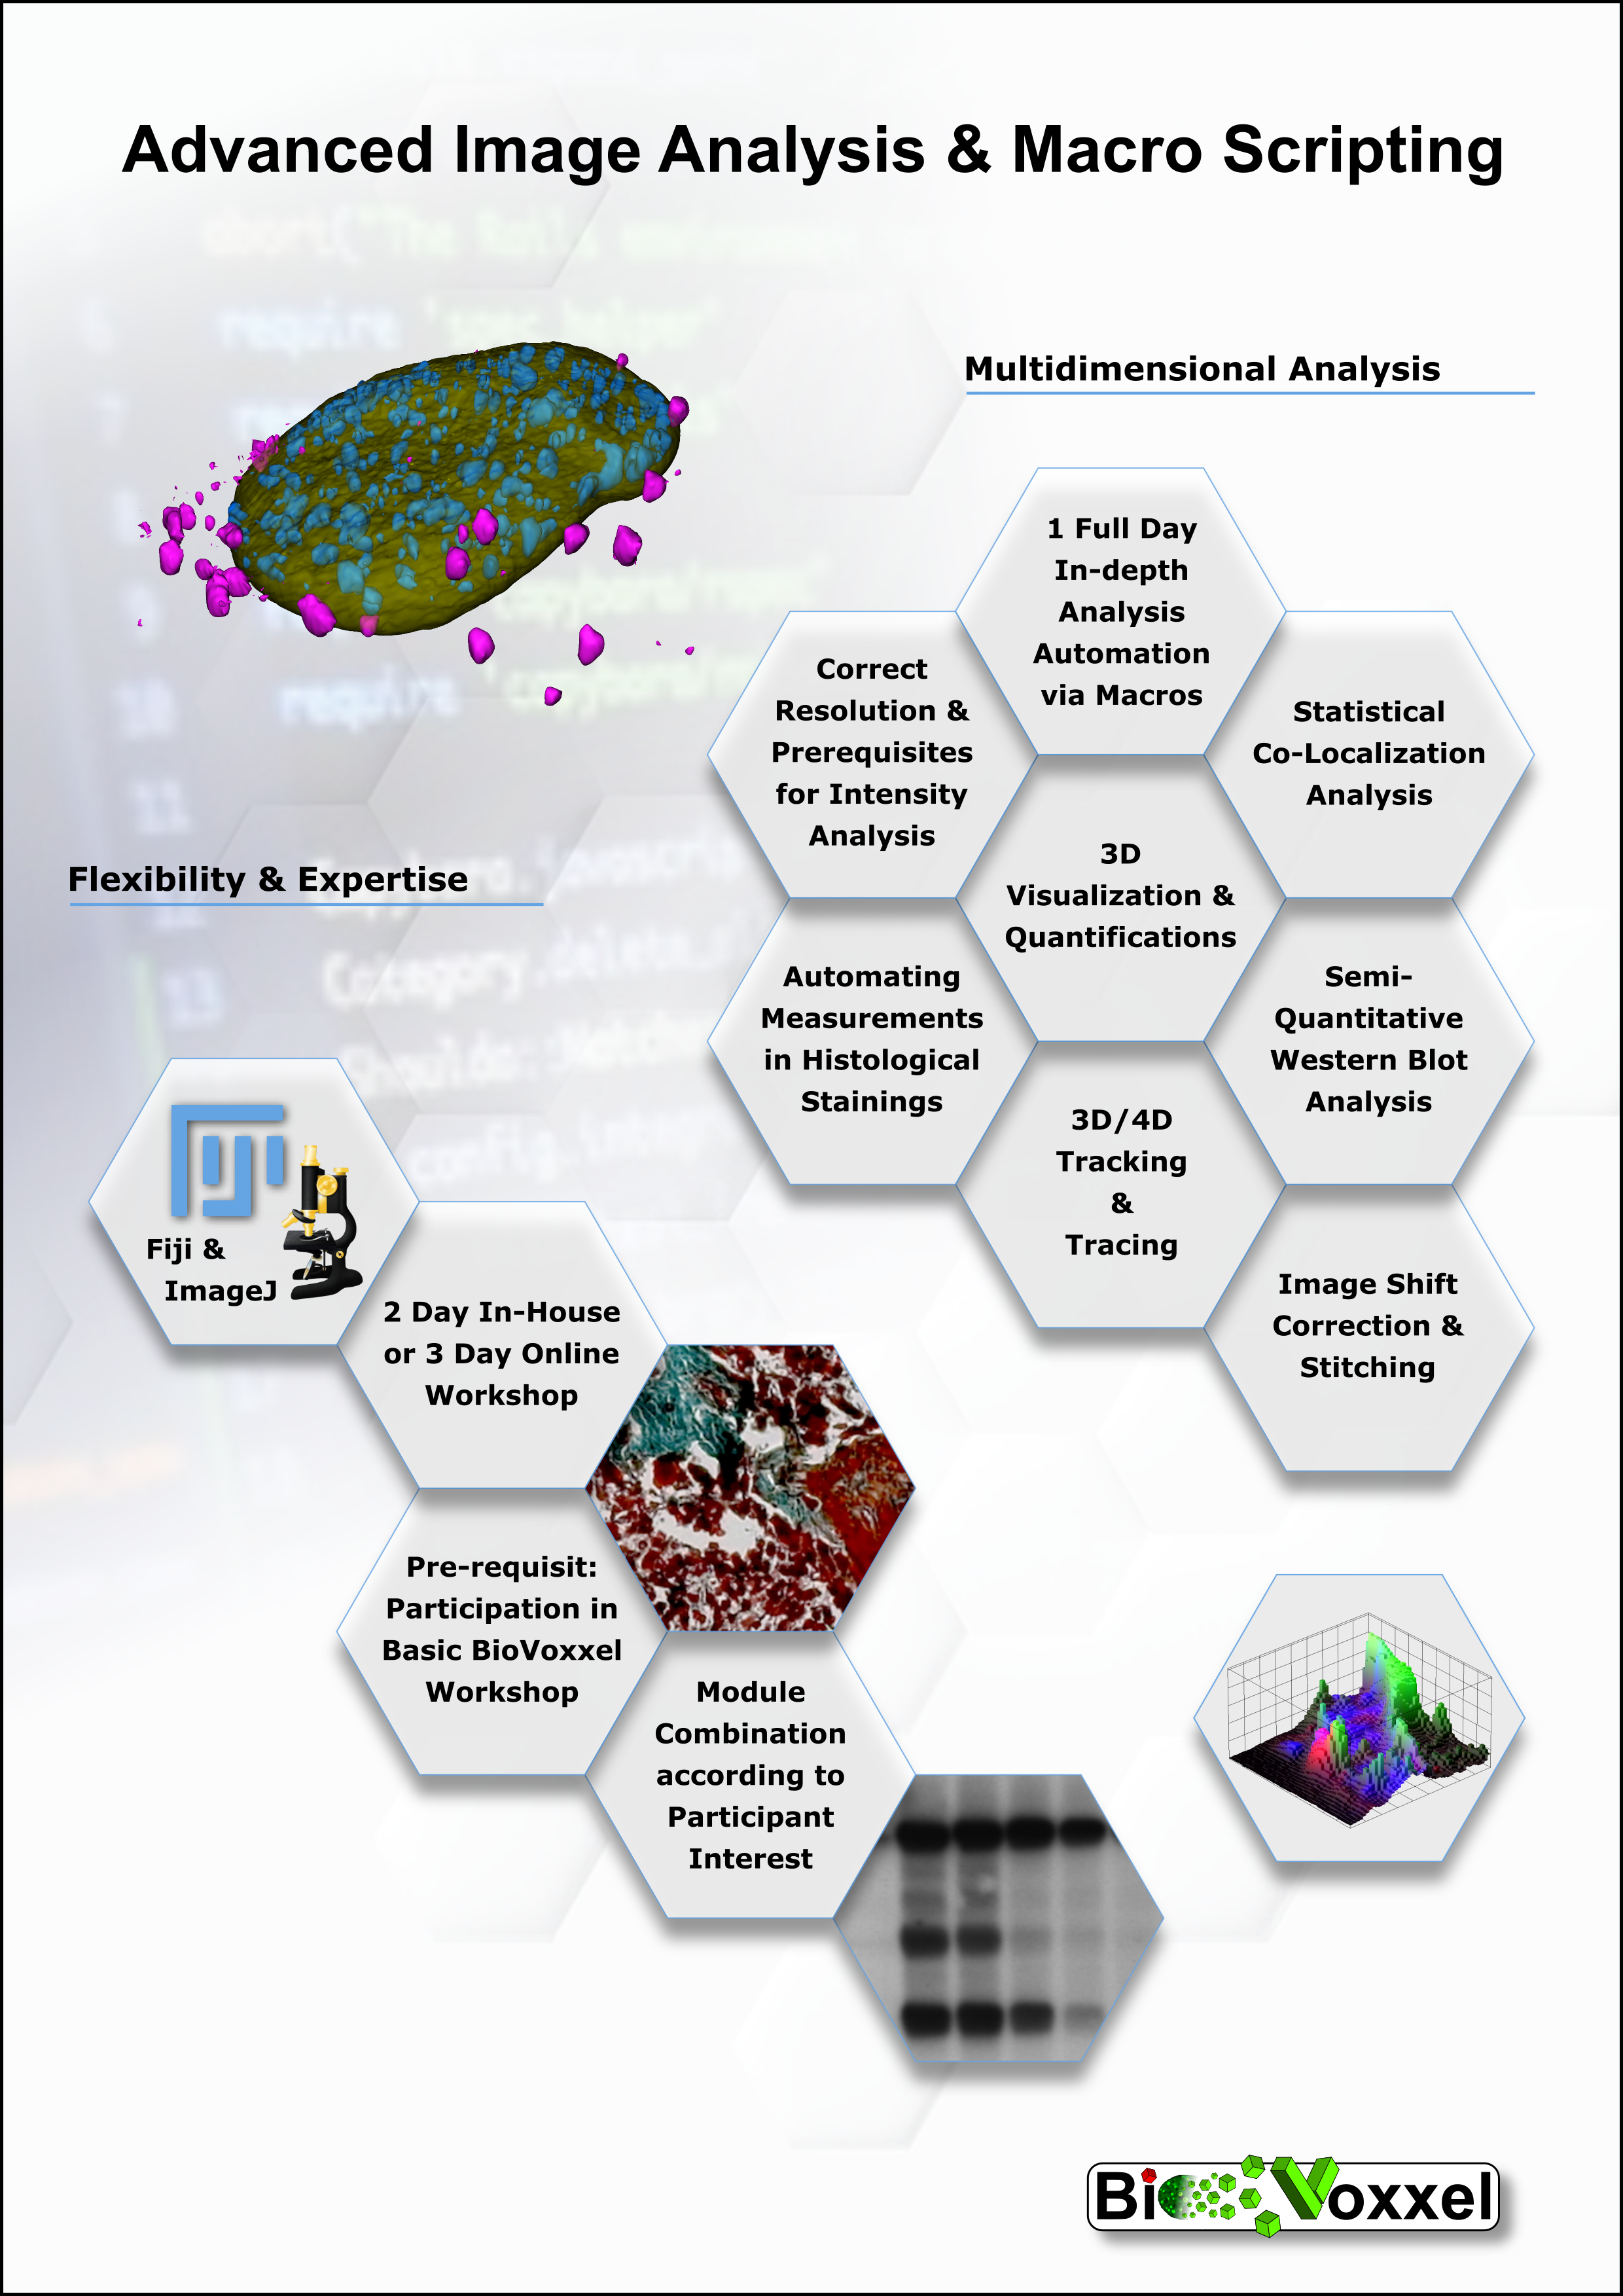 BioVoxxel Workshop - Macro Scripting and Advanced Image Analysis